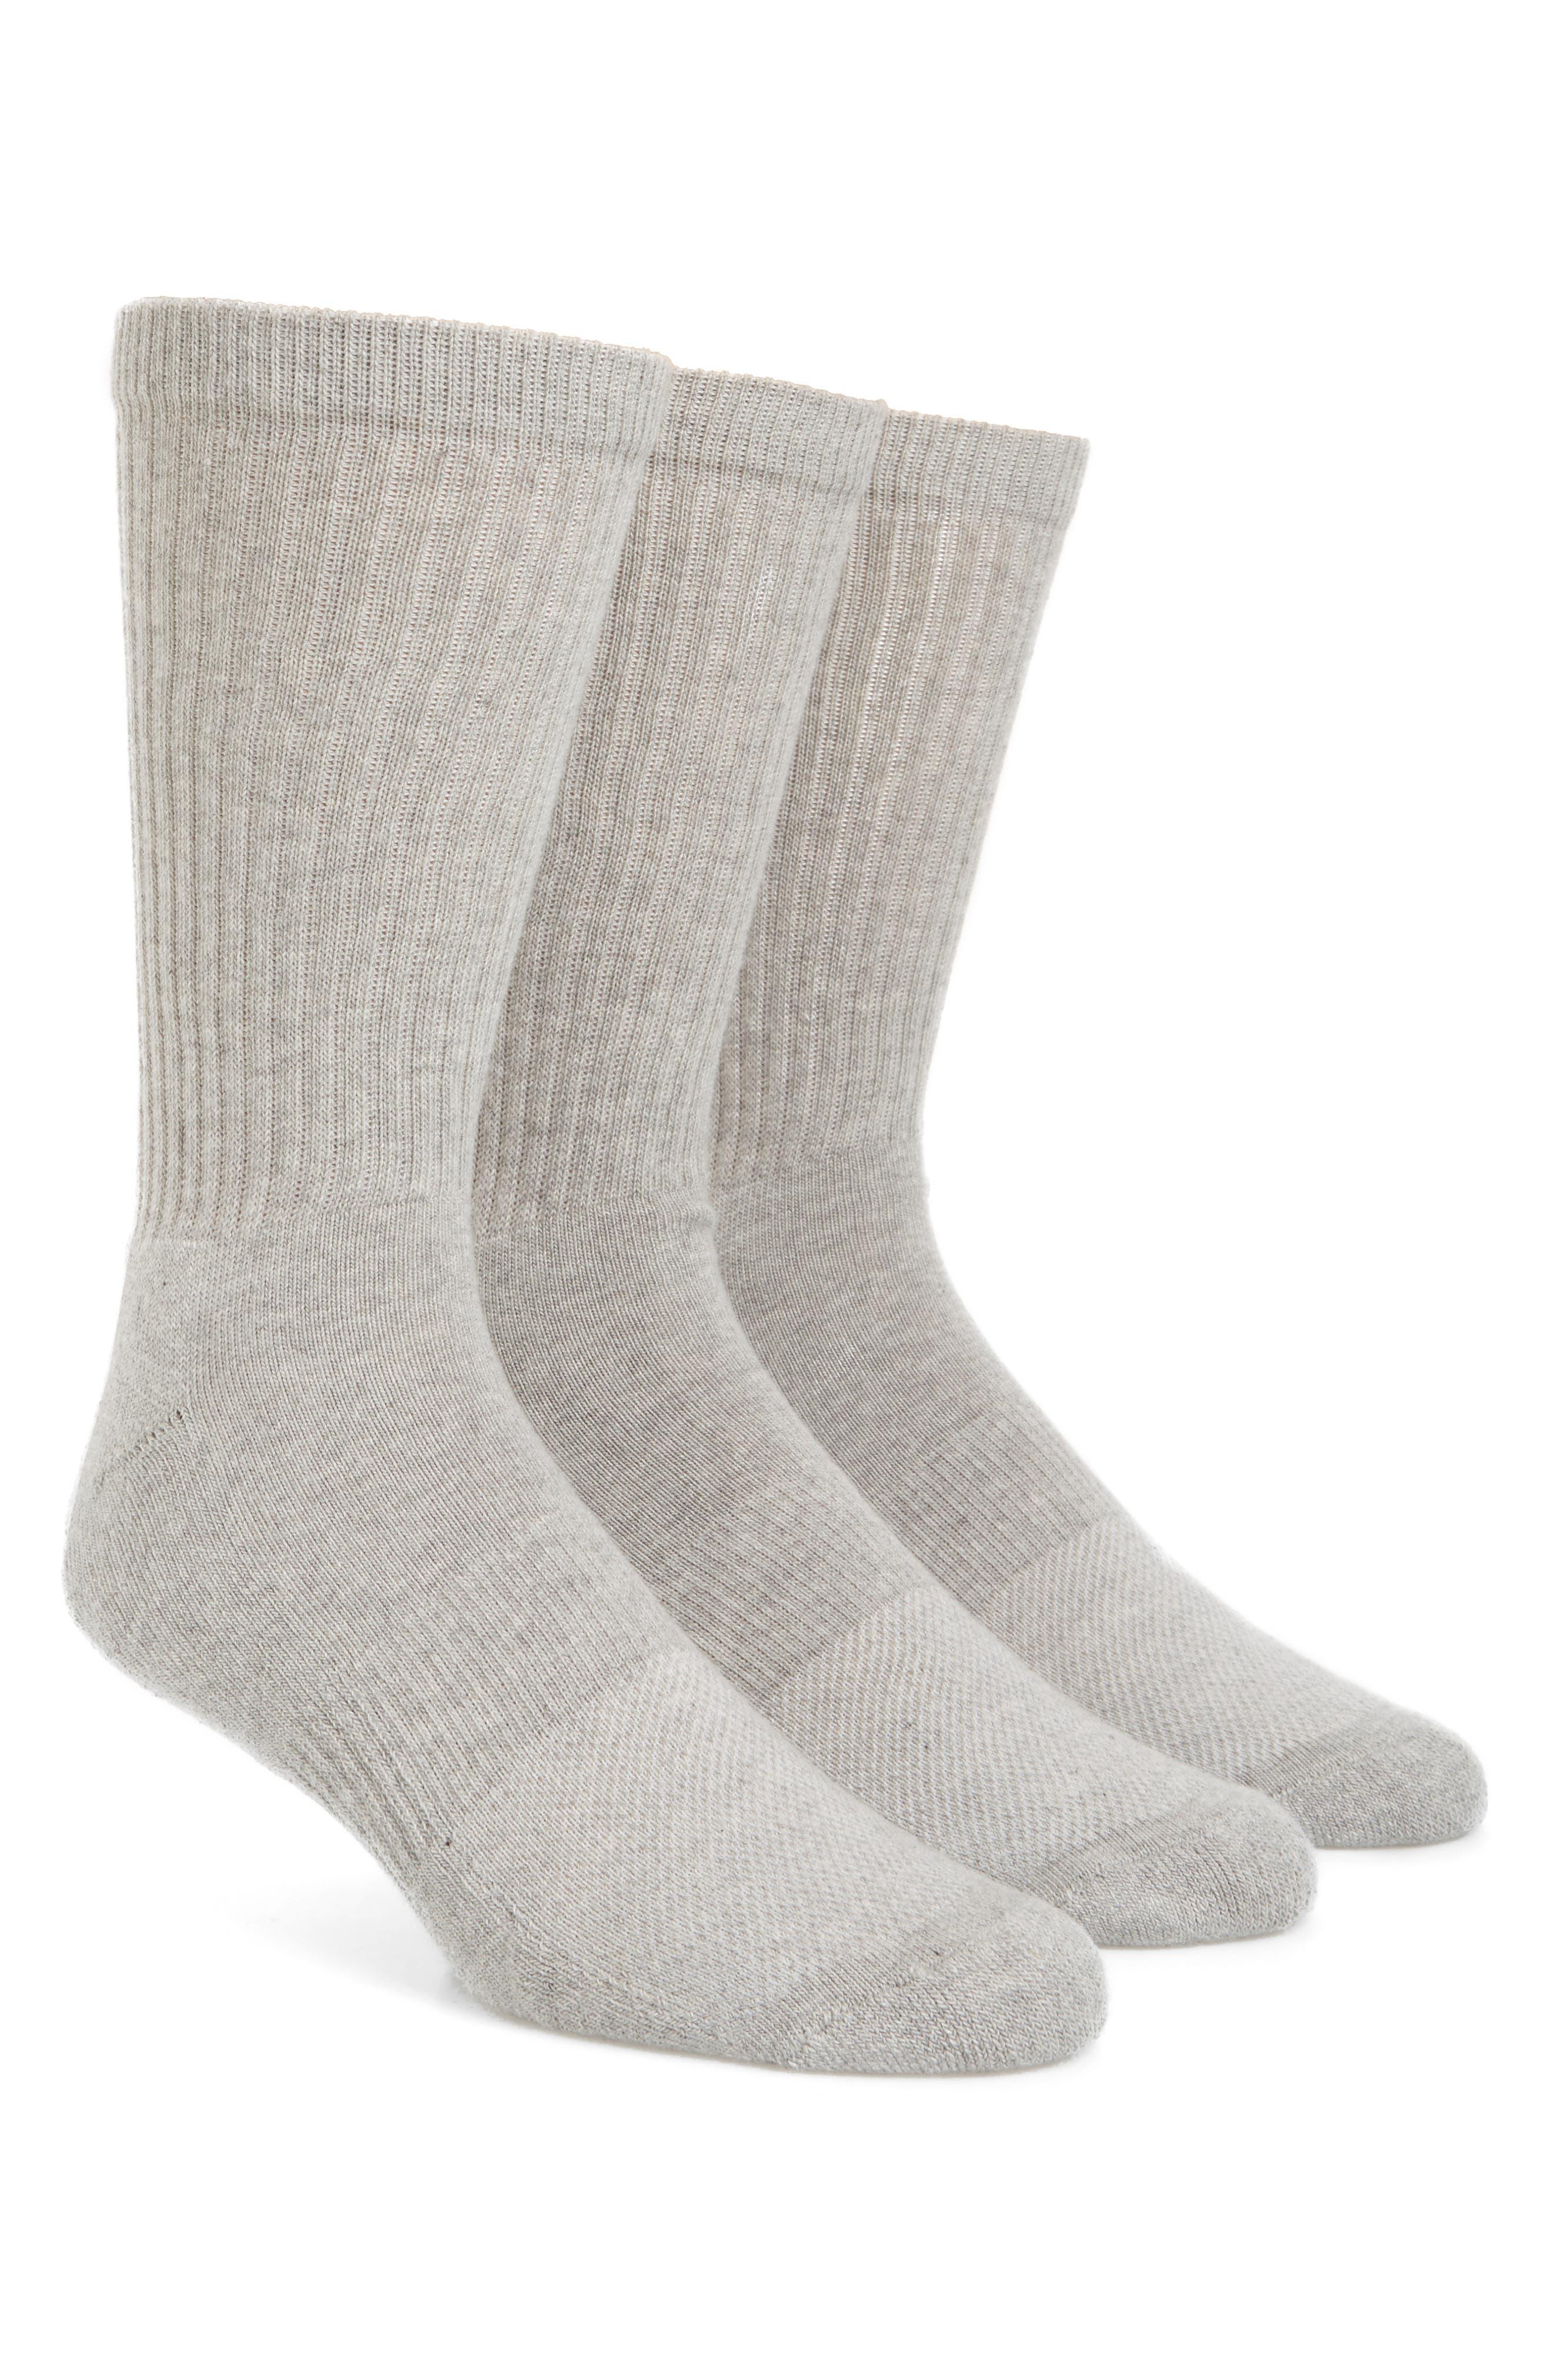 3-Pack Crew Cut Athletic Socks,                             Main thumbnail 2, color,